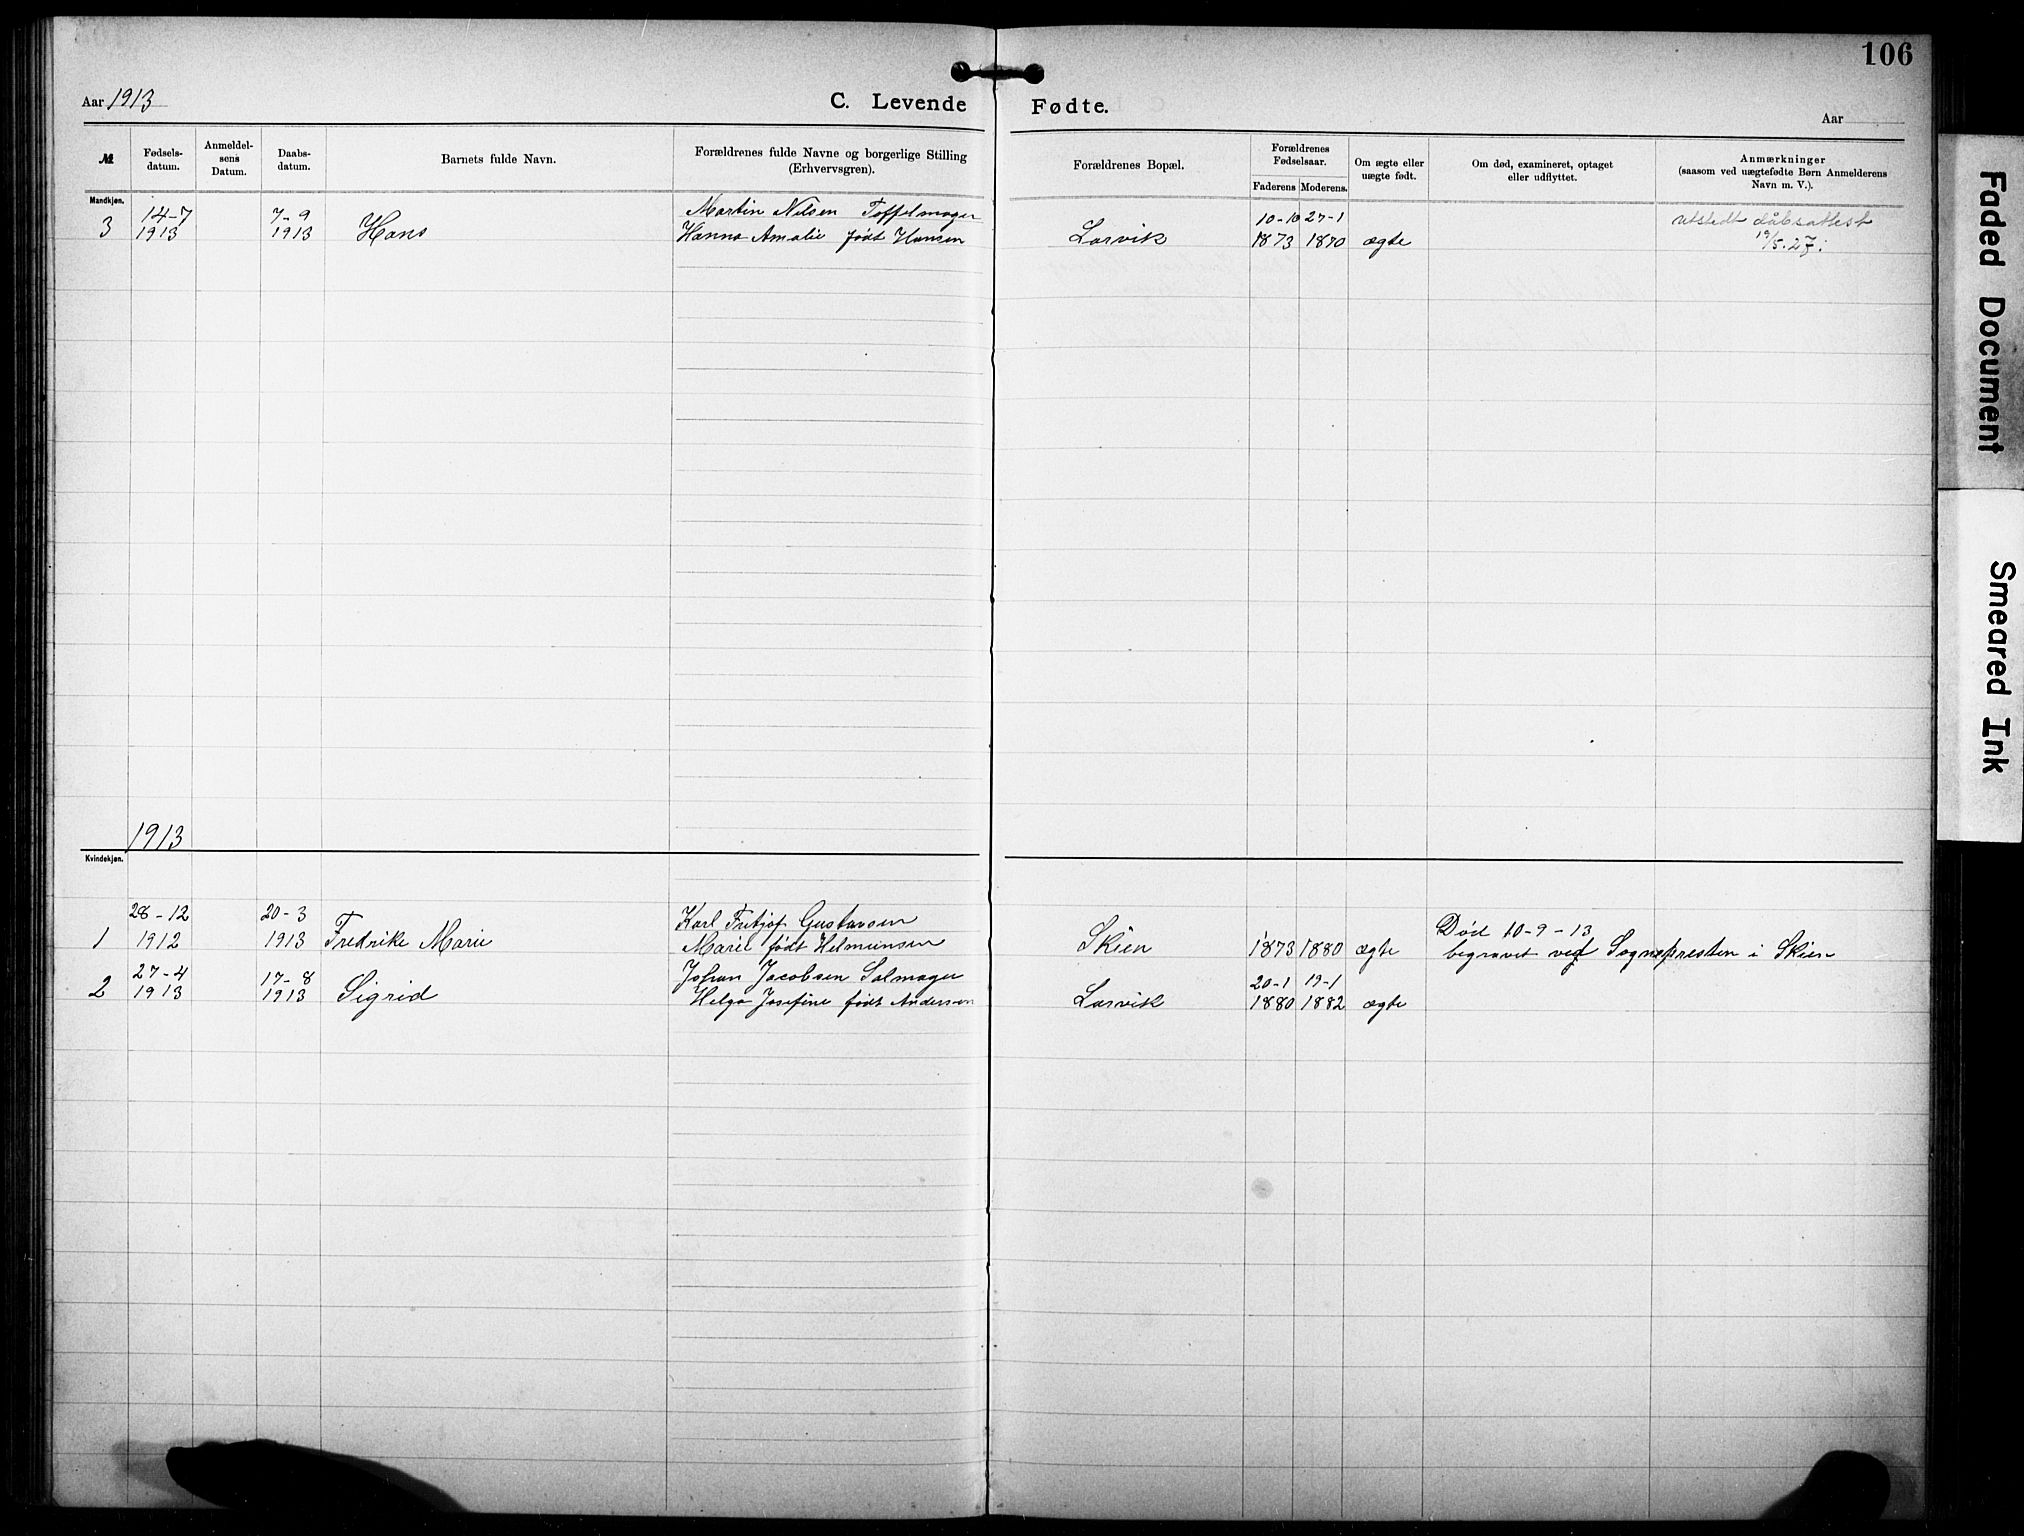 SAKO, Den katolsk-apostoliske menighet i Larvik, F/Fa/L0001: Dissenterprotokoll nr. 1, 1892-1933, s. 106